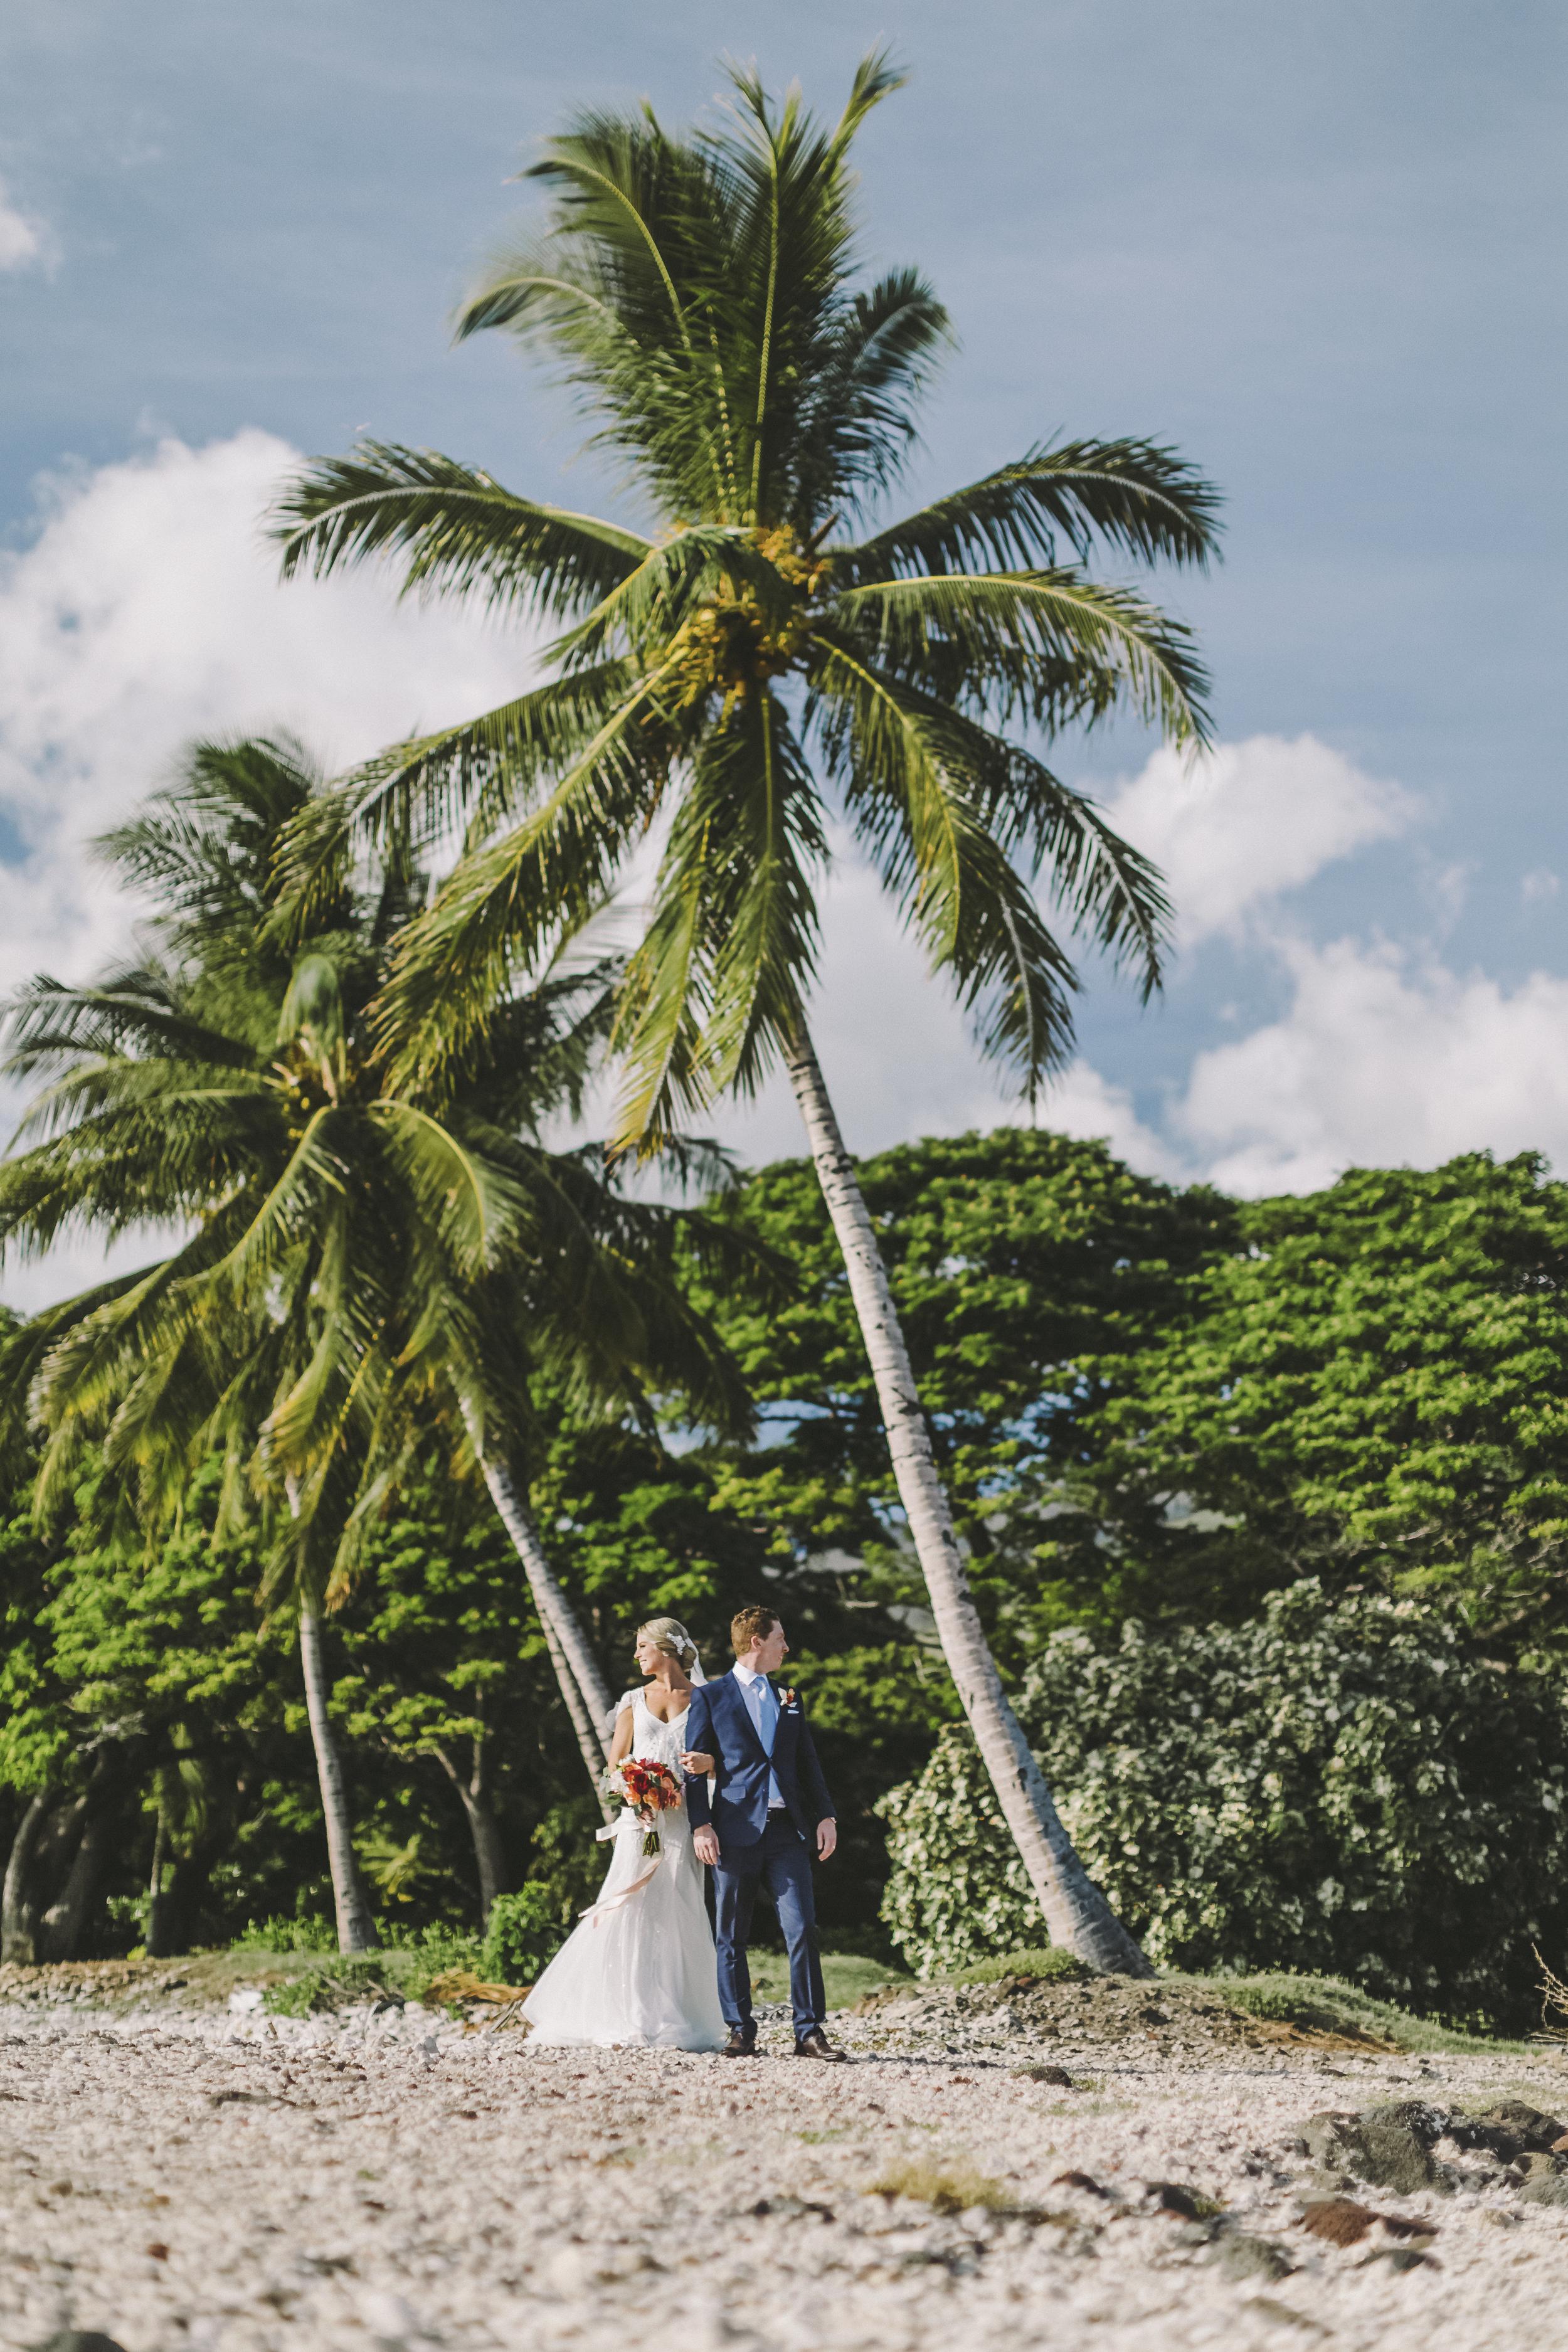 angie-diaz-photography-maui-wedding-mel-matt-68.jpeg